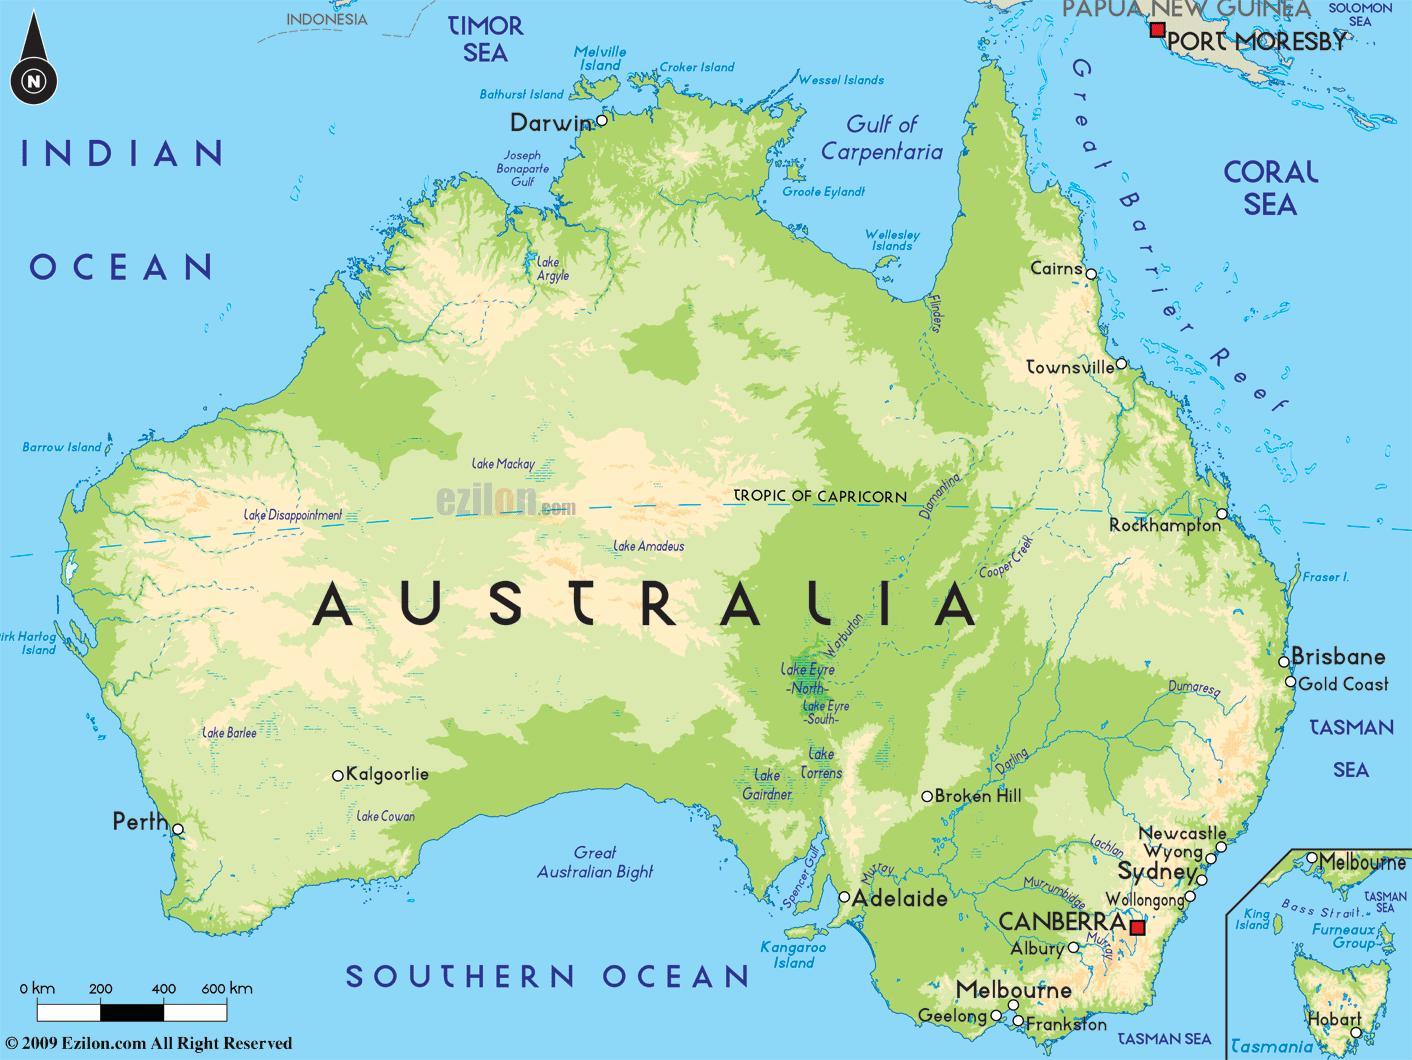 kart over australia Australia i kart   kart over Australia (Australia og New Zealand  kart over australia